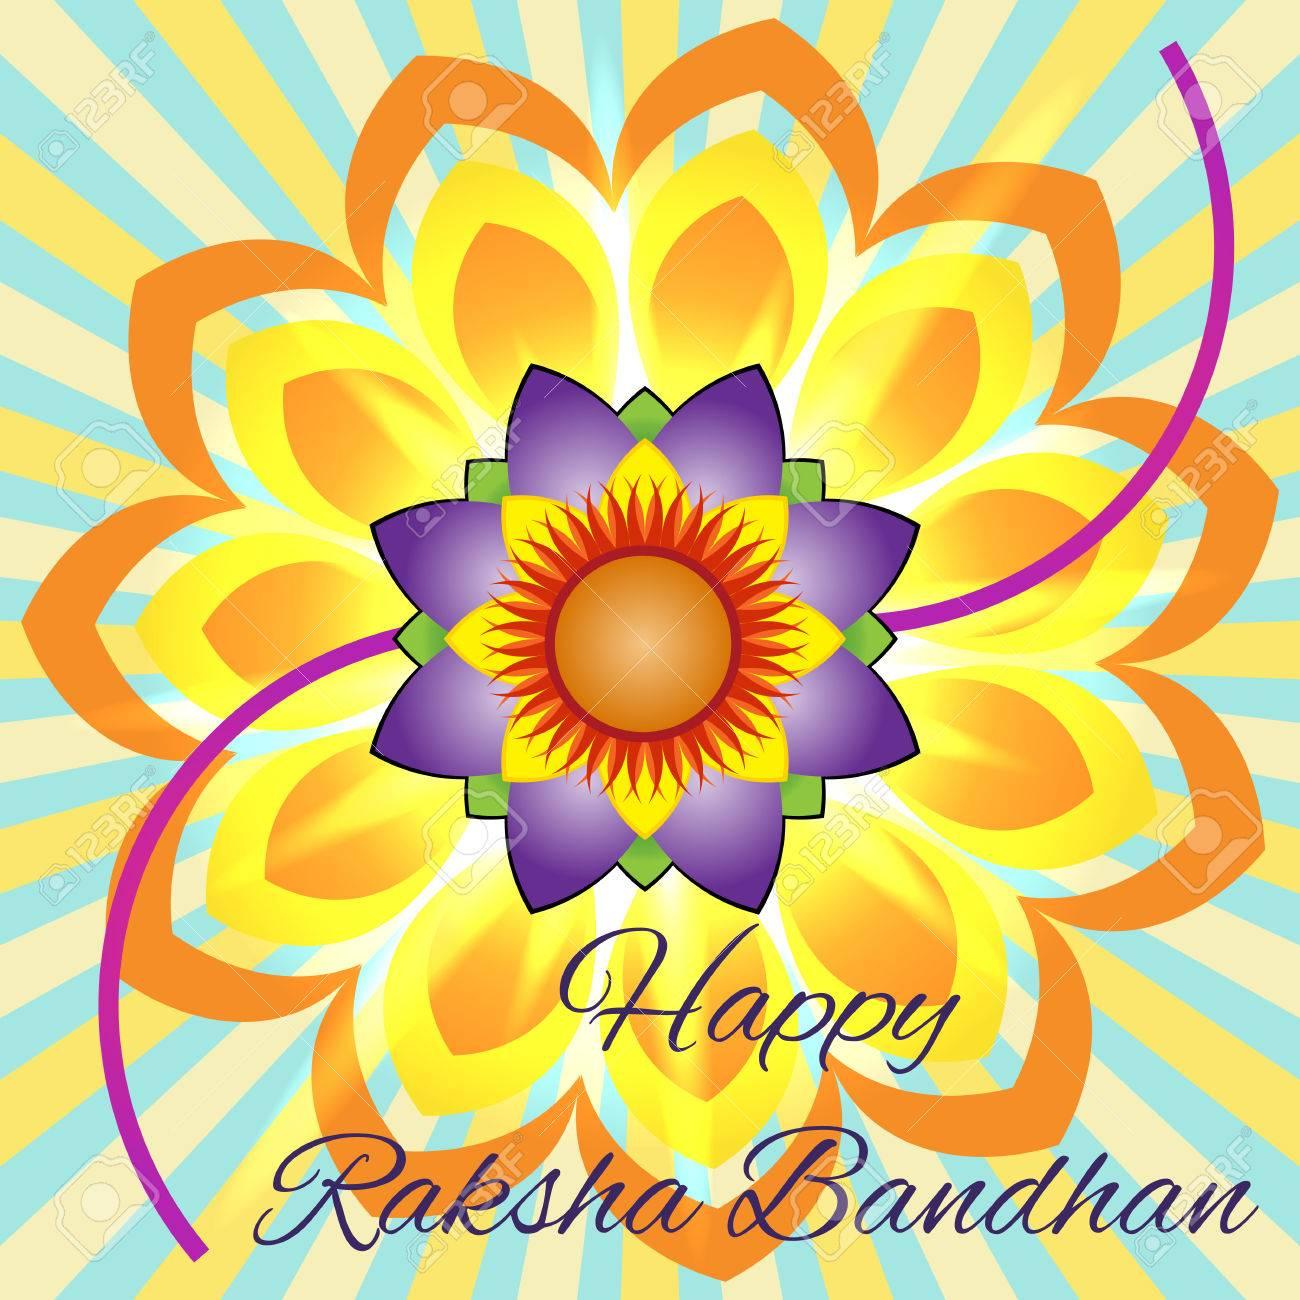 Happy Raksha Bandhan Elegant Greeting Card With Beautiful Rakhi